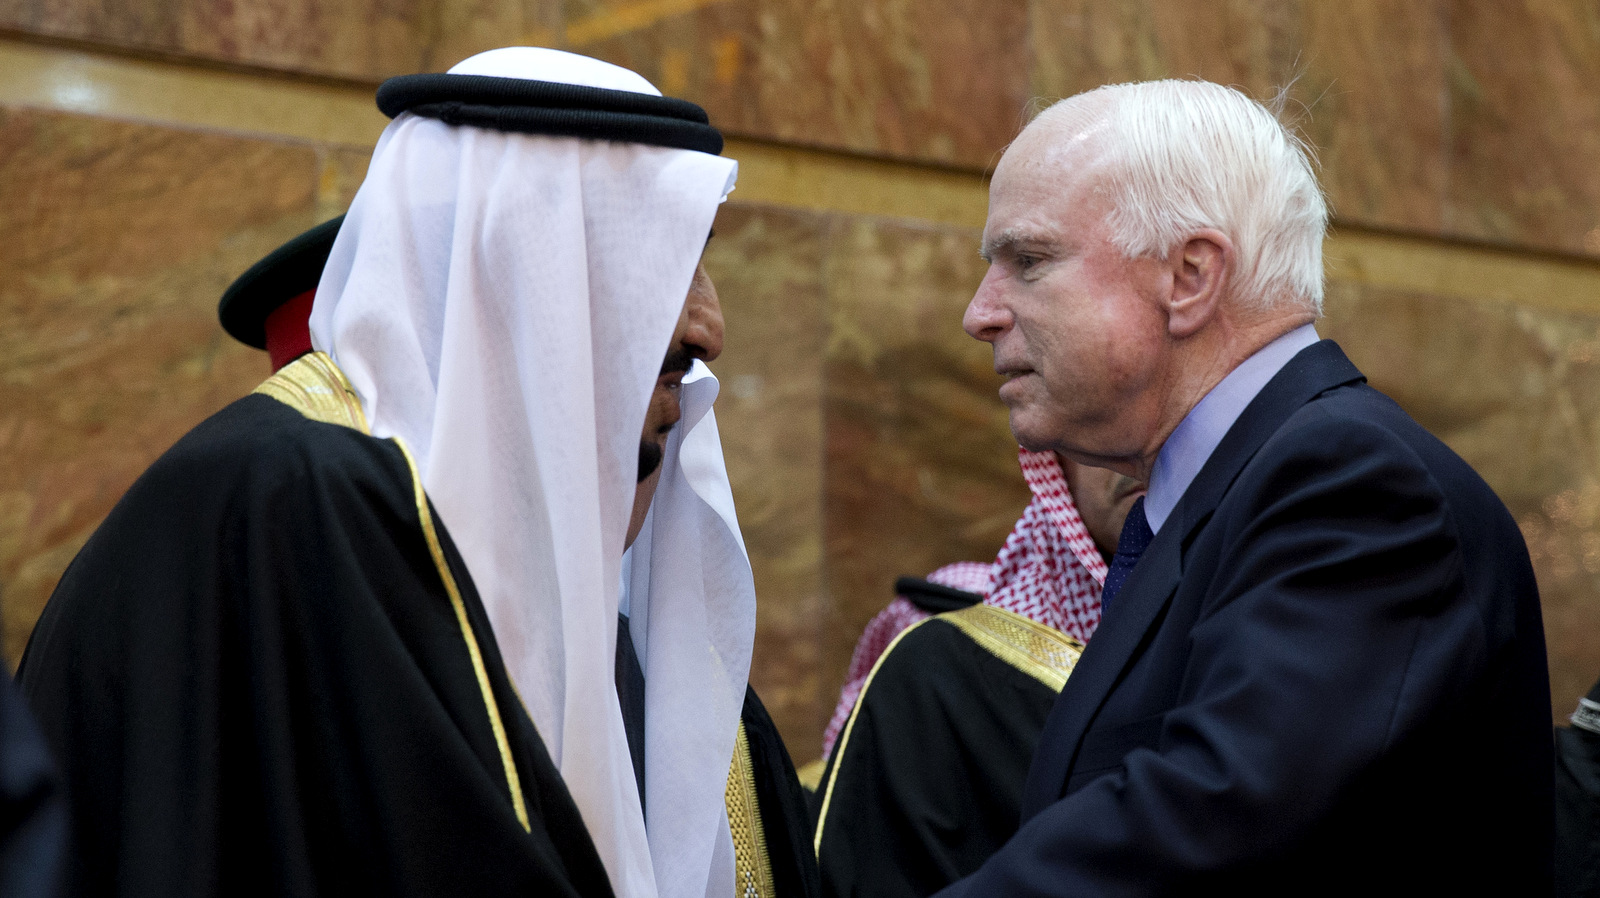 U.S. Sen. John McCain, R-Ariz., greets Saudi Arabia's King, Salman bin Abdul Aziz in Riyadh, Saudi Arabia. (AP/Carolyn Kaster)